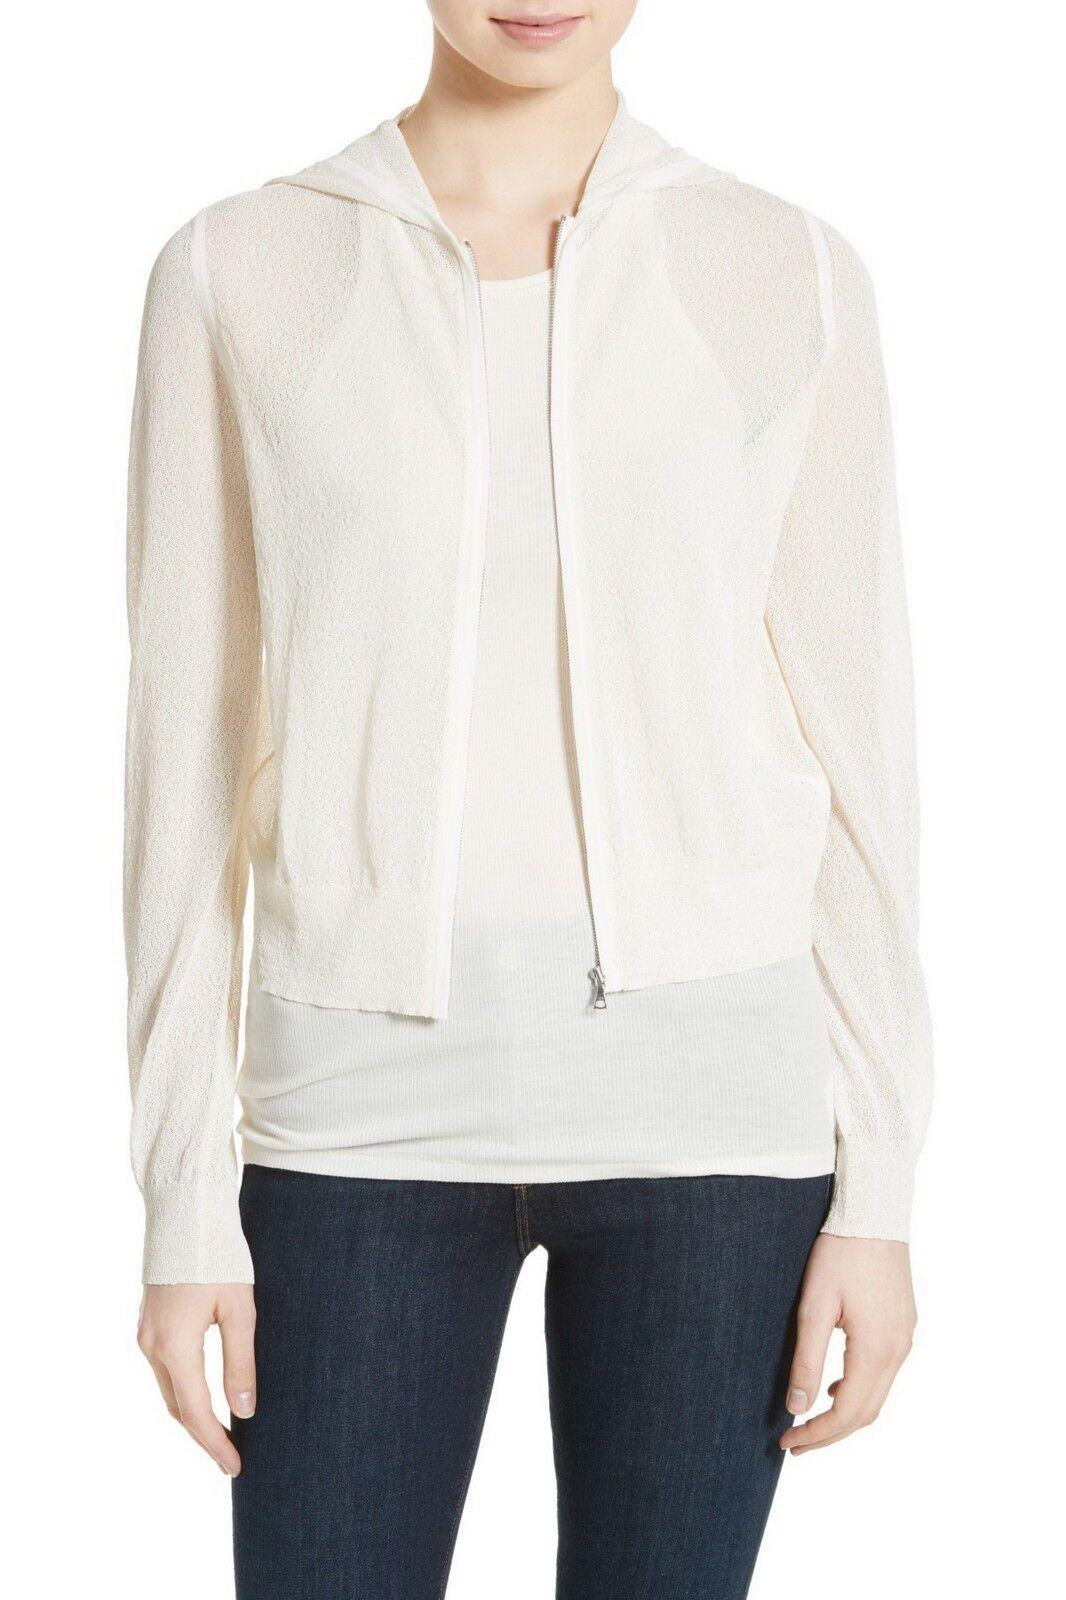 NWT Theory Hodina B Crimp Knit Hoodie, Ivory, Medium, retail  295